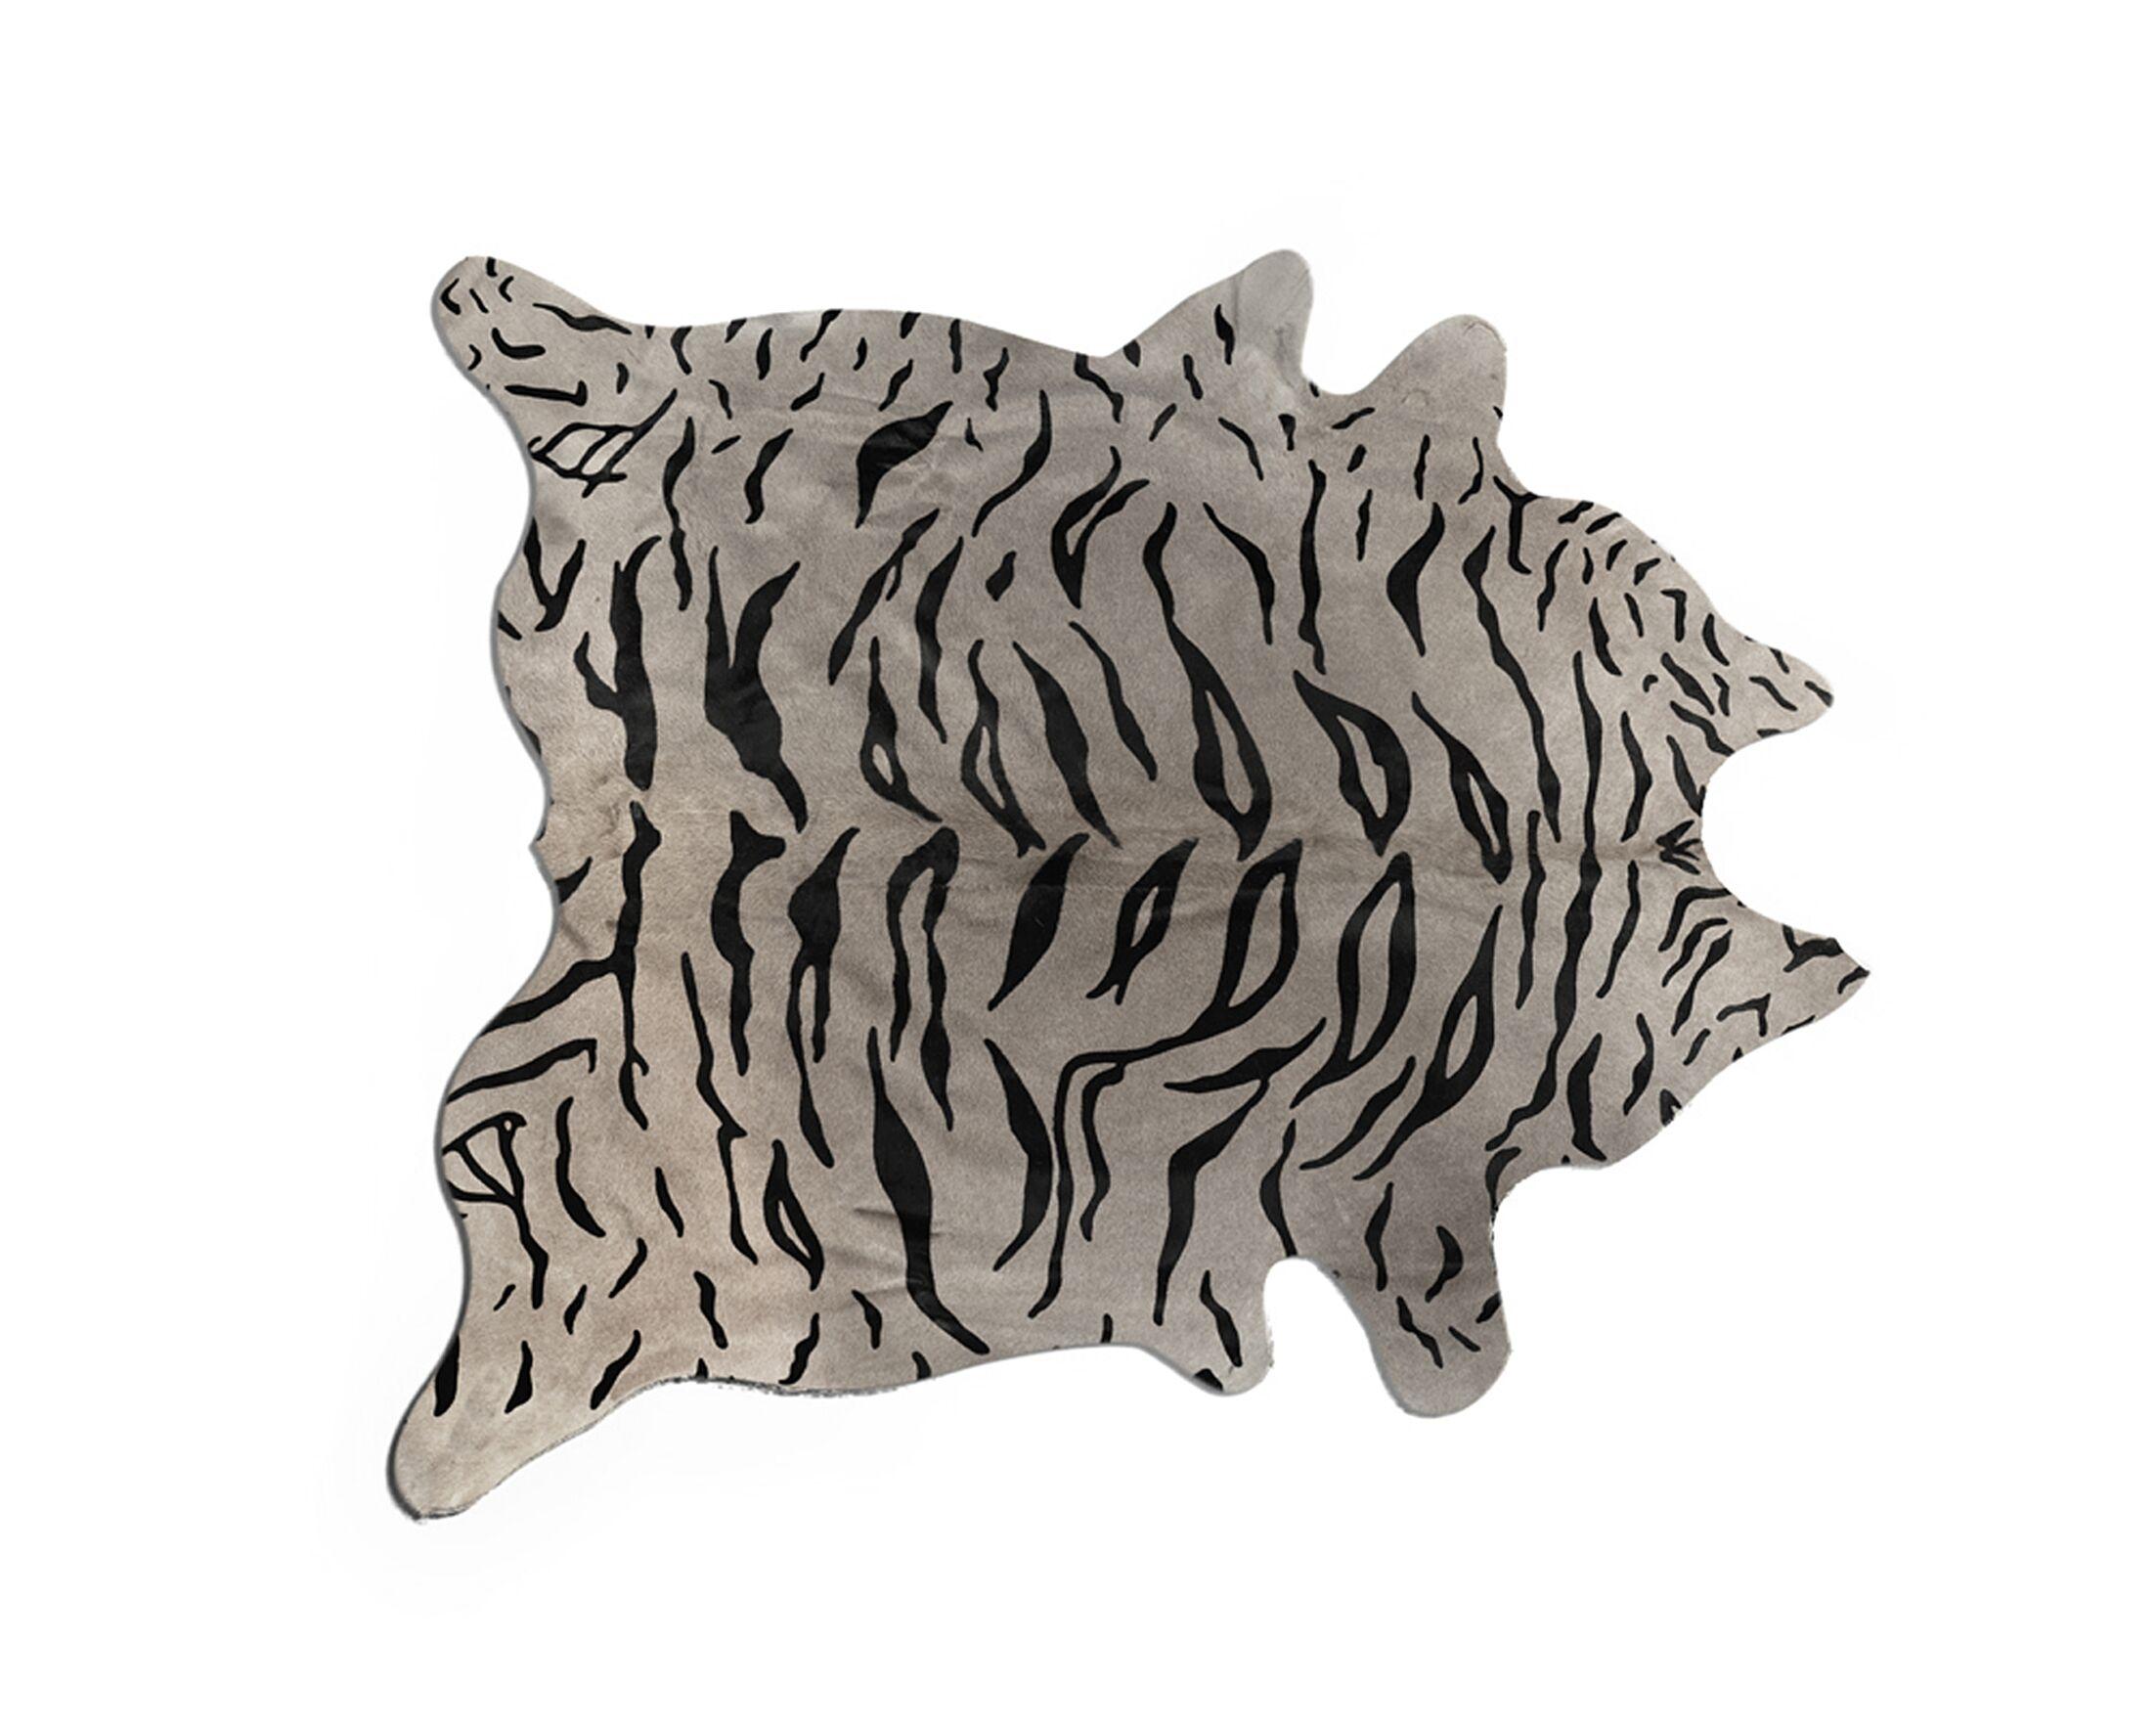 Kronborg Hand-Woven Cowhide Black/Gray Area Rug Rug Size: 6' X 7'